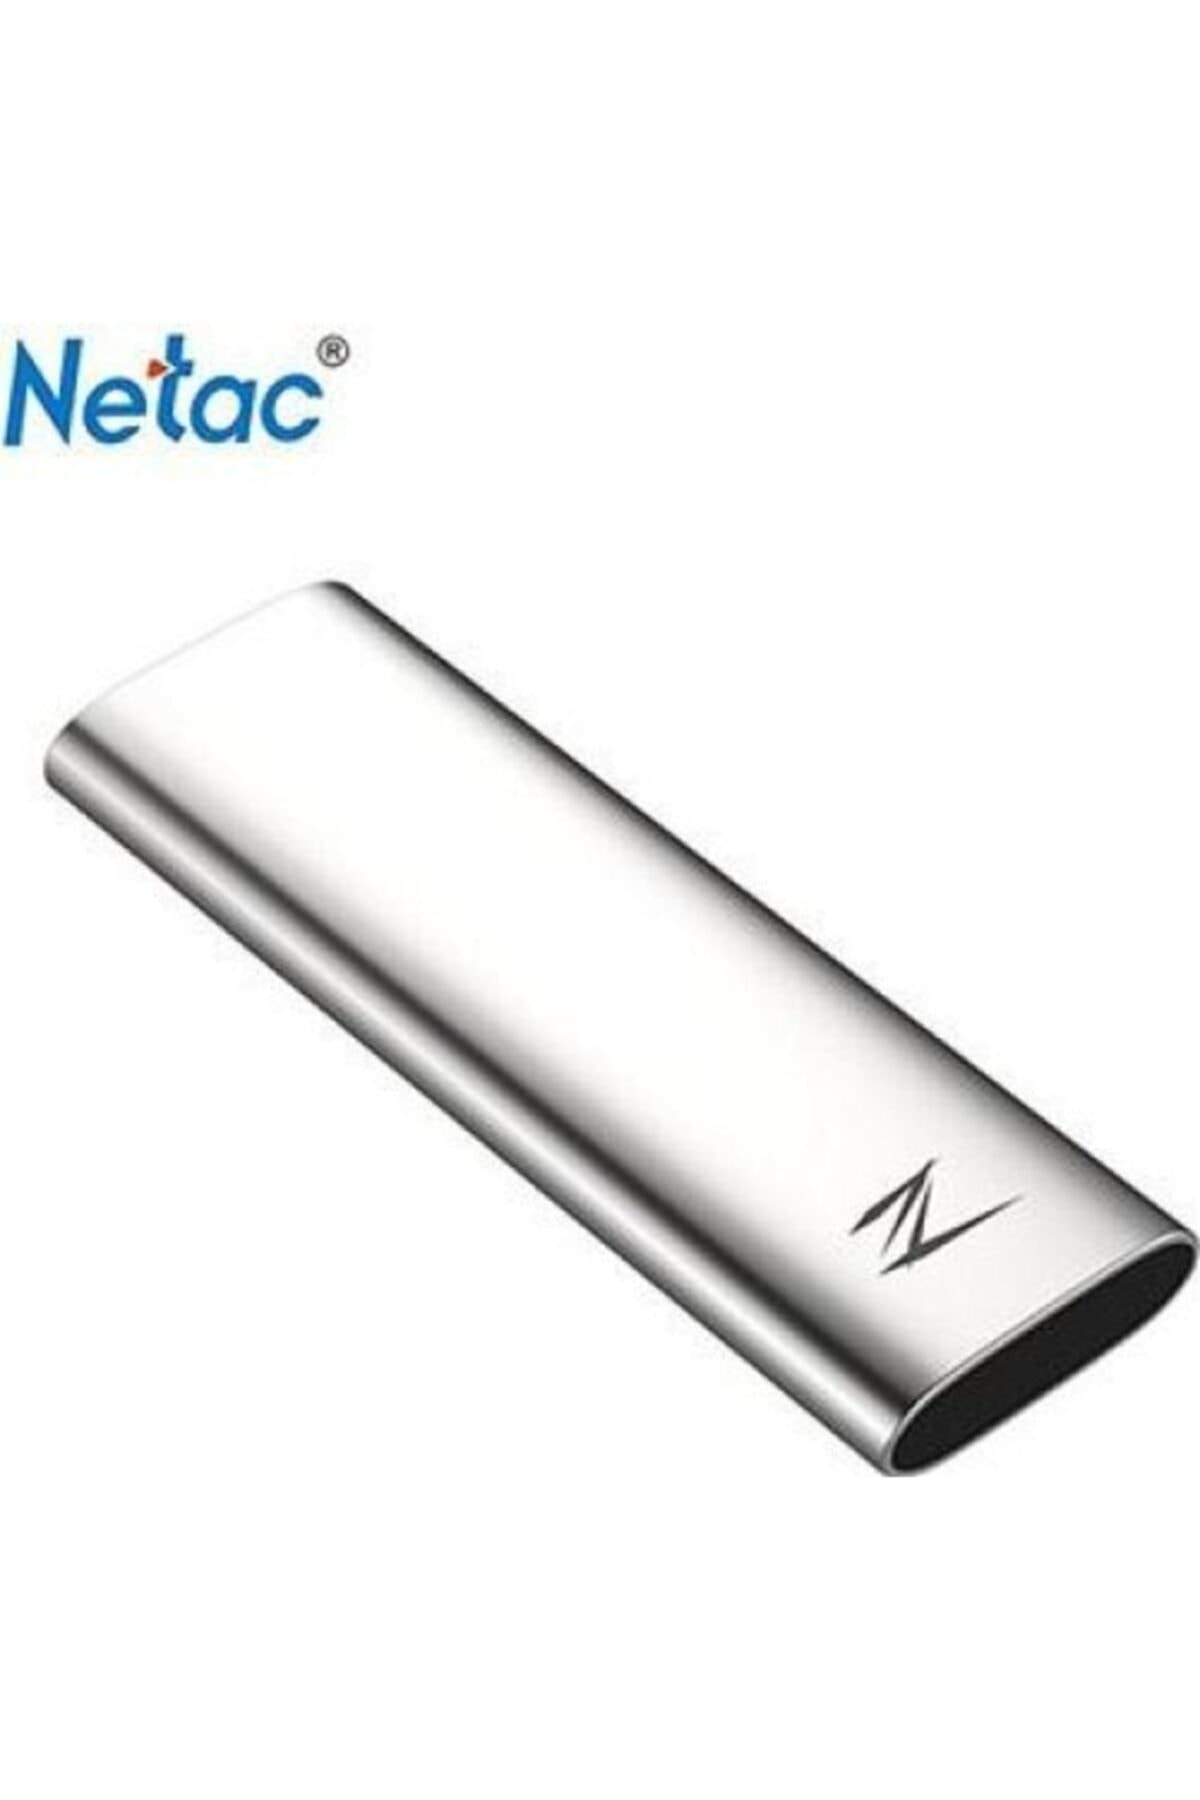 Netac Taşınabilir Ssd Z Slim 250gb 1